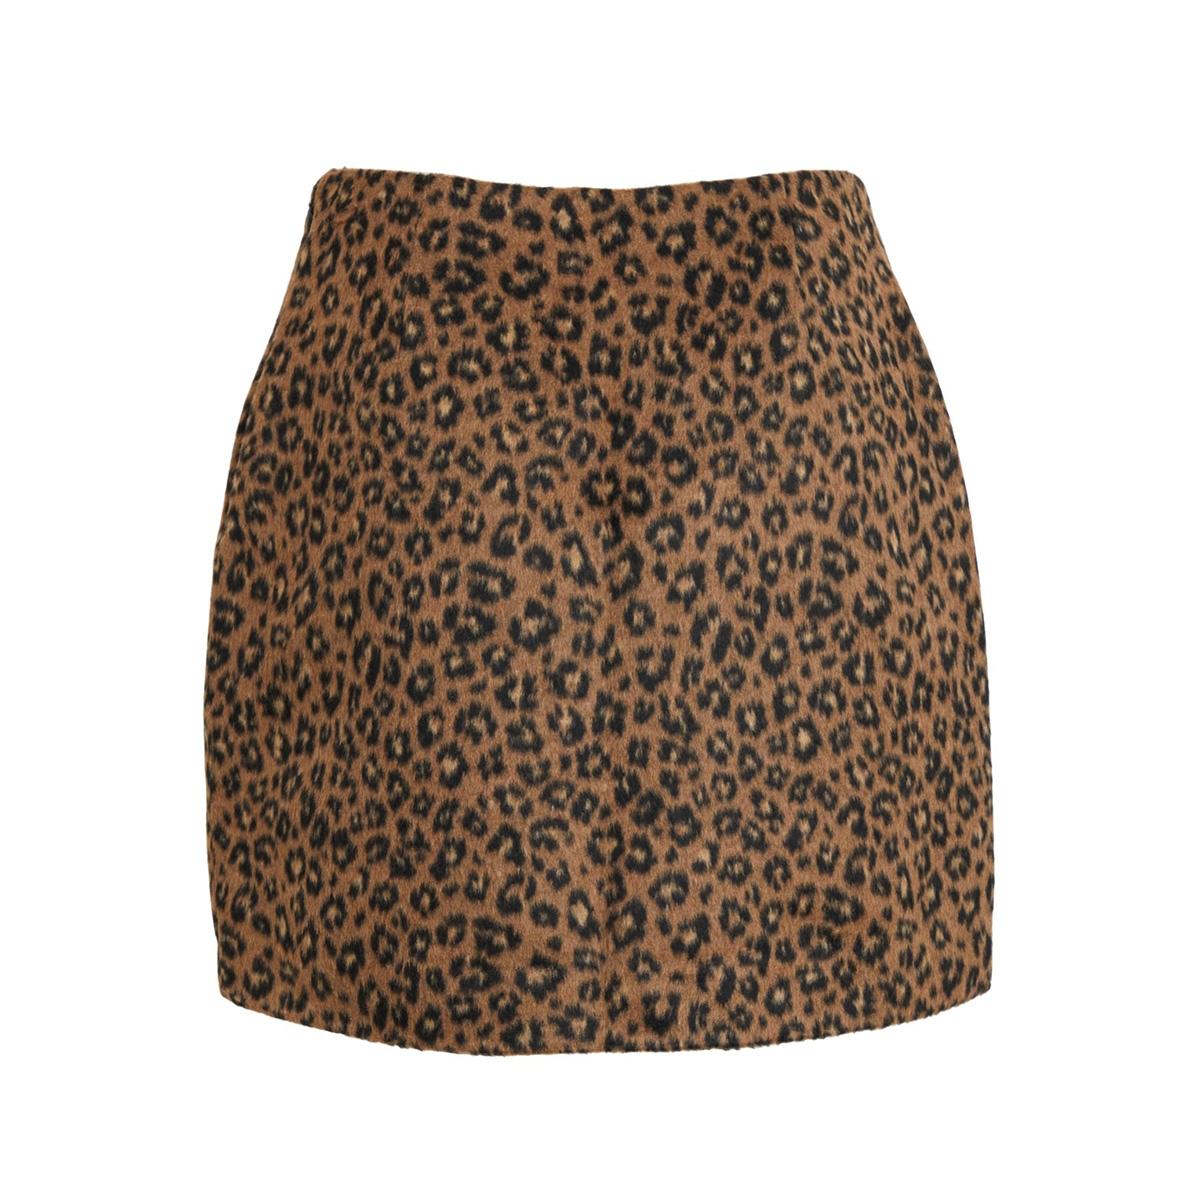 vijunilaanimala hw skirt 14054371 vila rok toffee/leopard